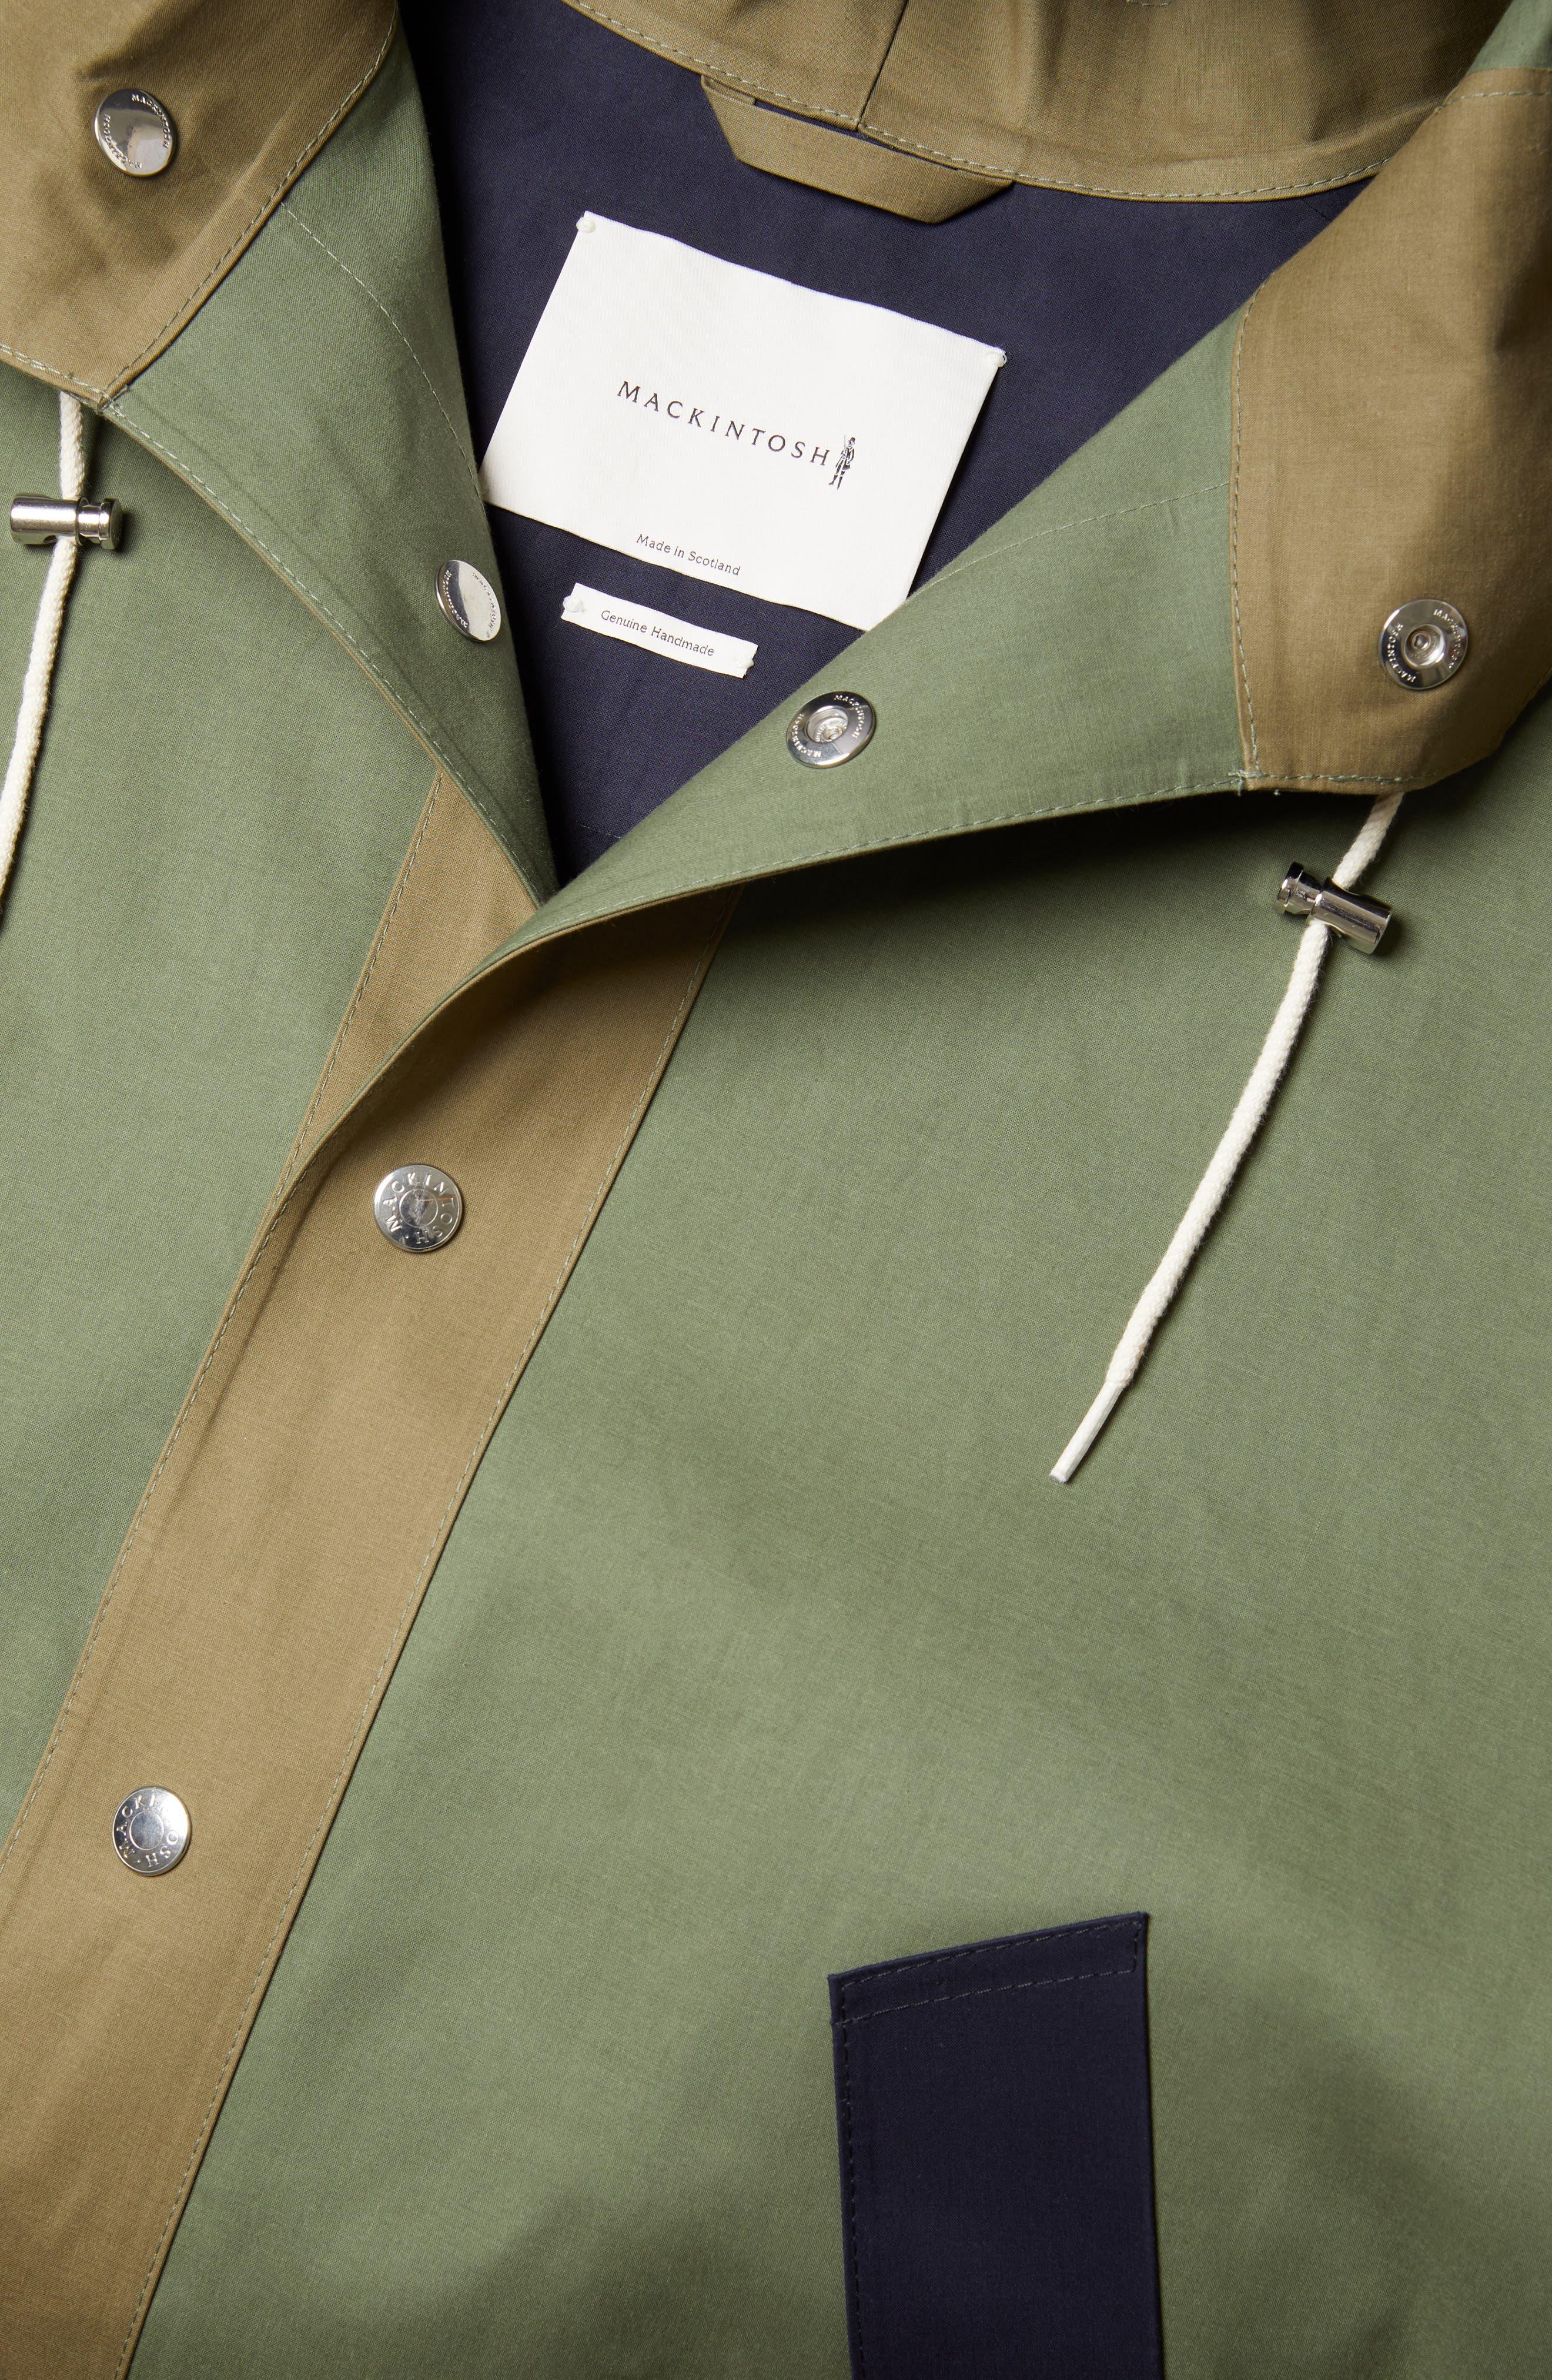 MACKINTOSH, Gents Bonded Cotton Hooded Poncho, Alternate thumbnail 5, color, FOUR LEAF CLOVER/ BLUE DEPTH